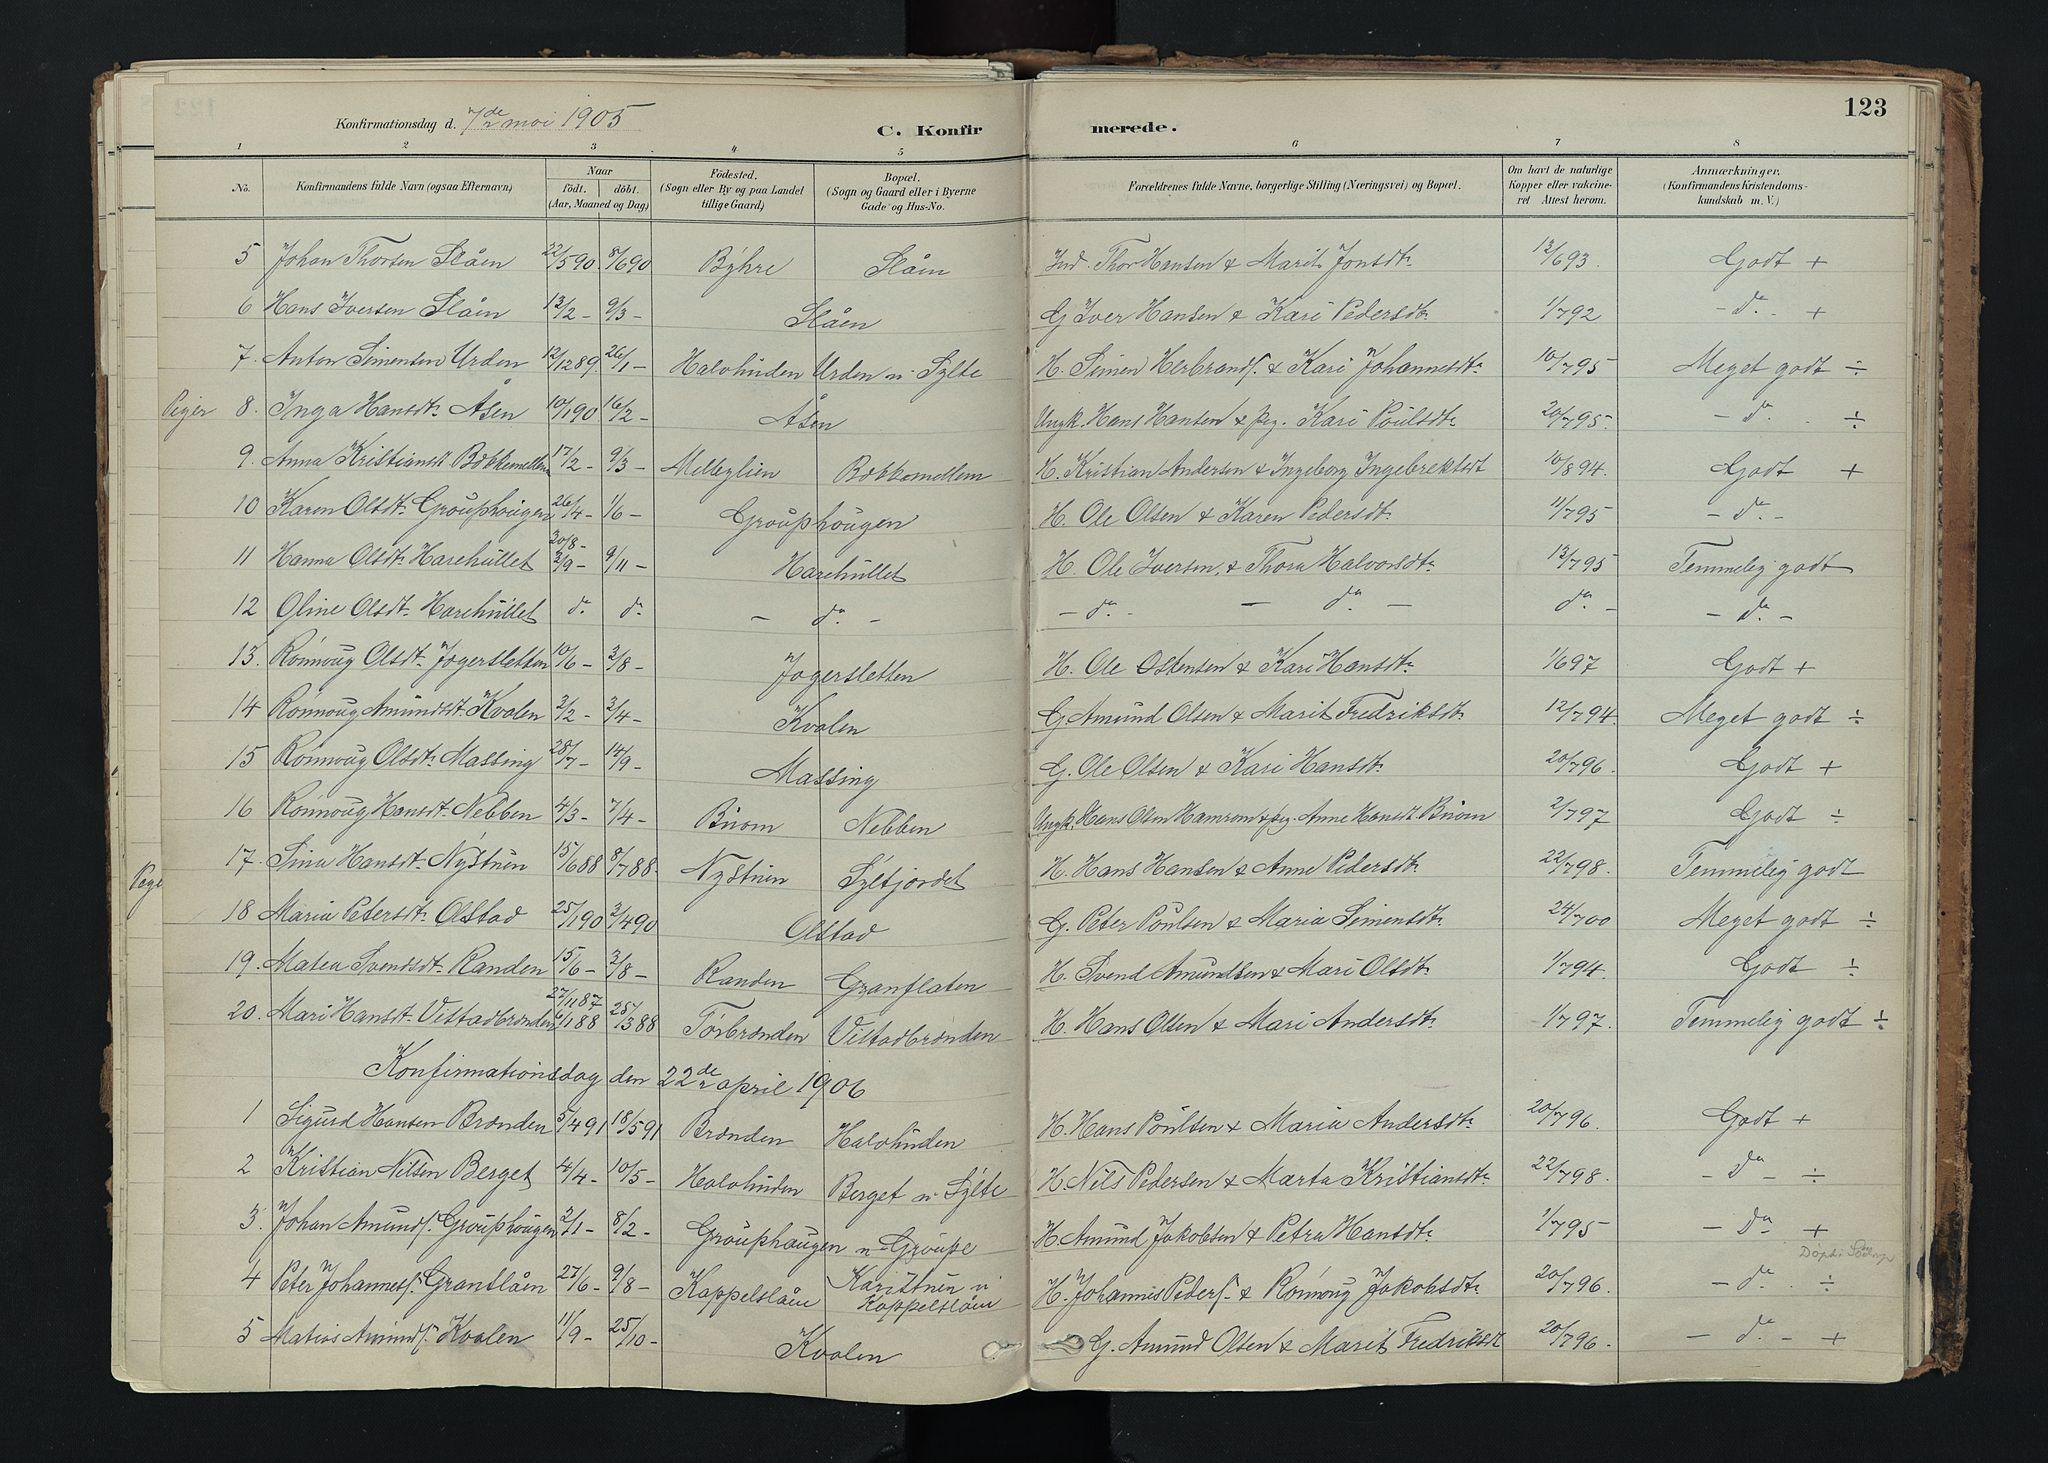 SAH, Nord-Fron prestekontor, Ministerialbok nr. 5, 1884-1914, s. 123